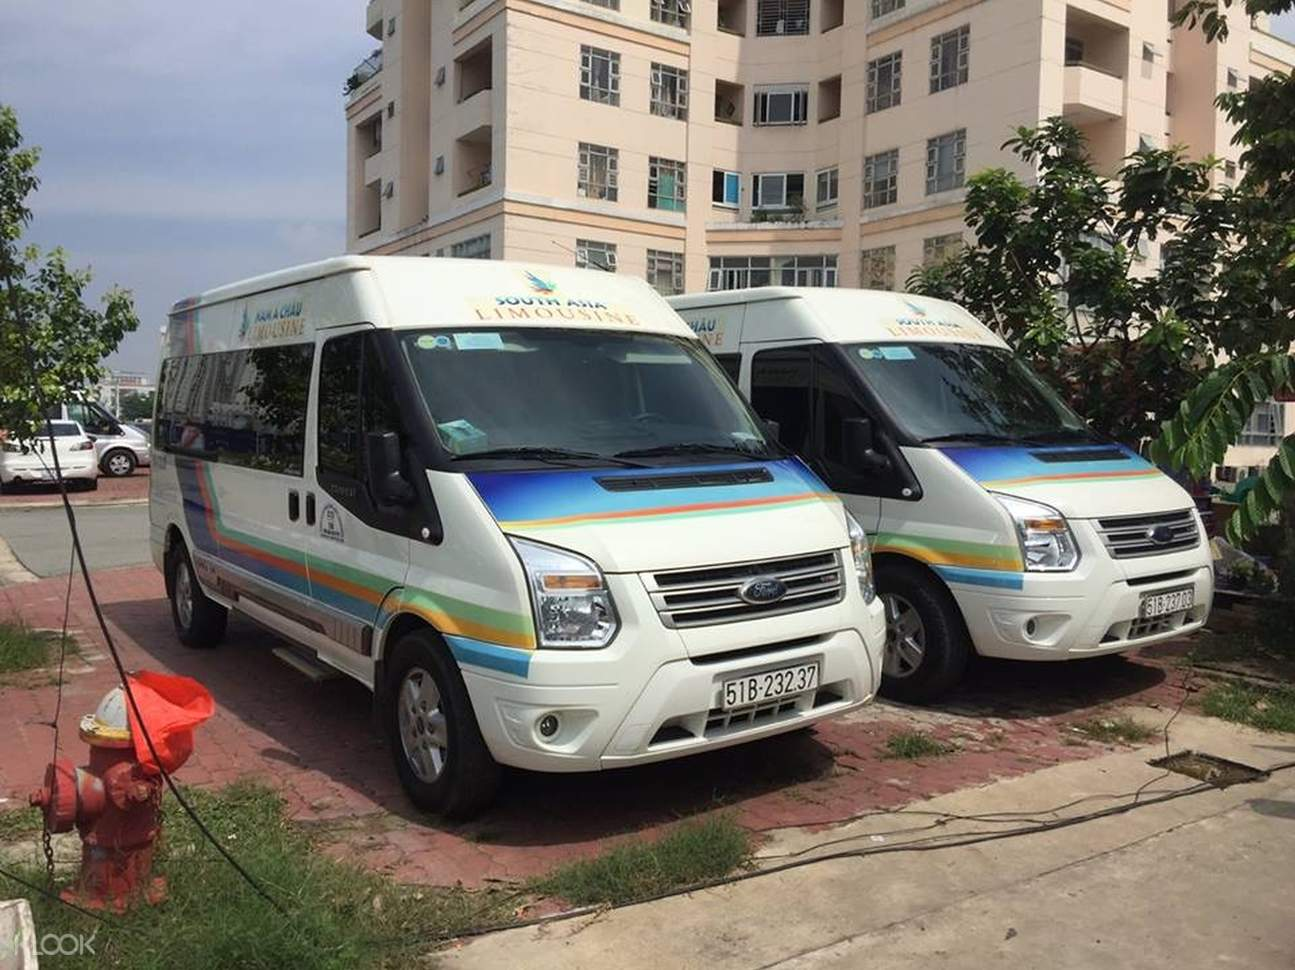 nam a chau limousine transfers for ho chi minh city and phan thiet